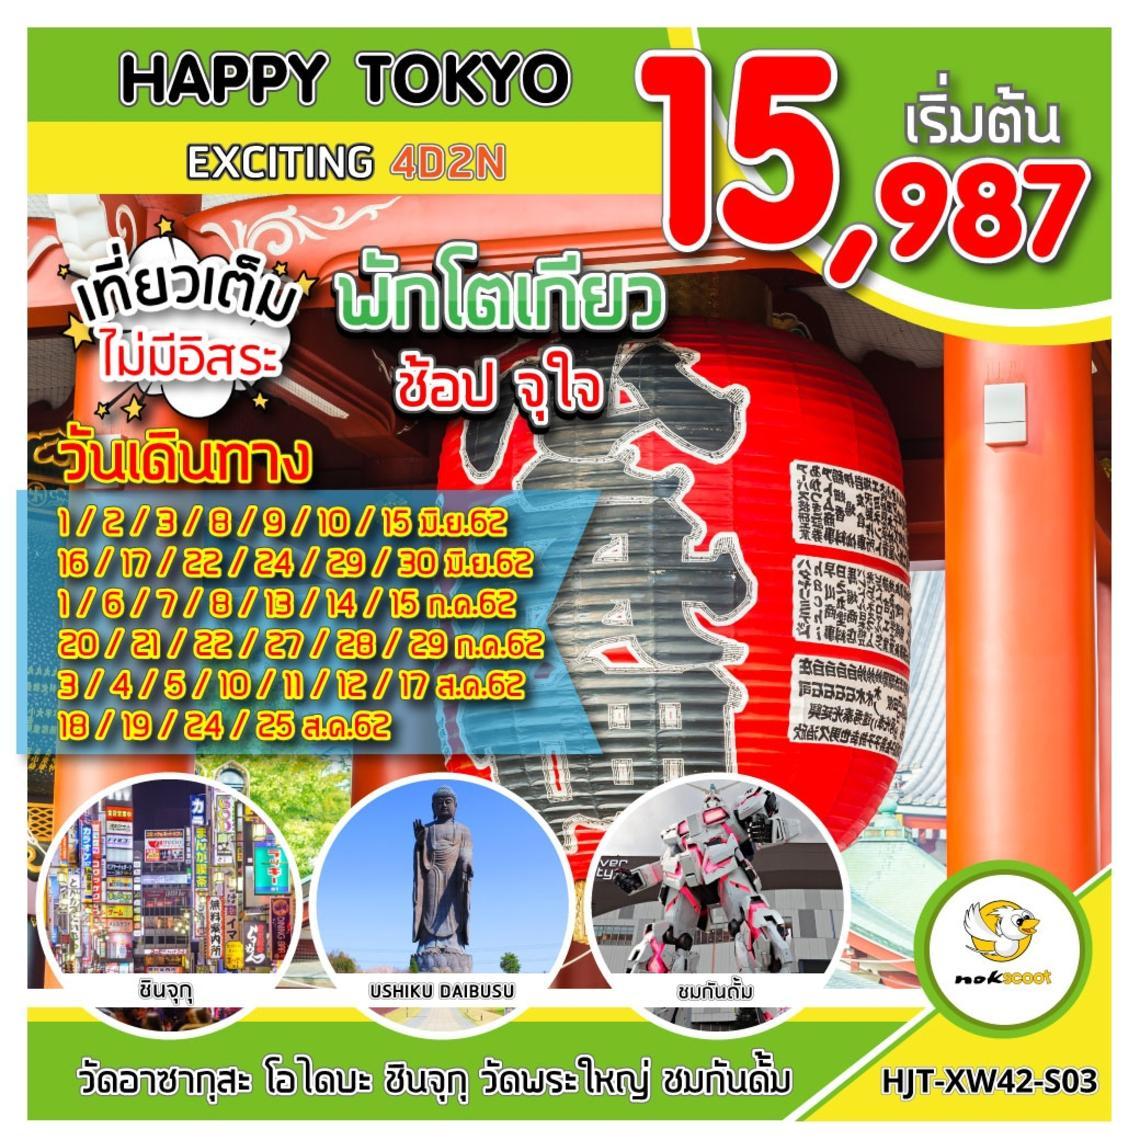 HJT-XW42-S03 HAPPY TOKYO EXCITING 4D2N UPDATE 5/3/19